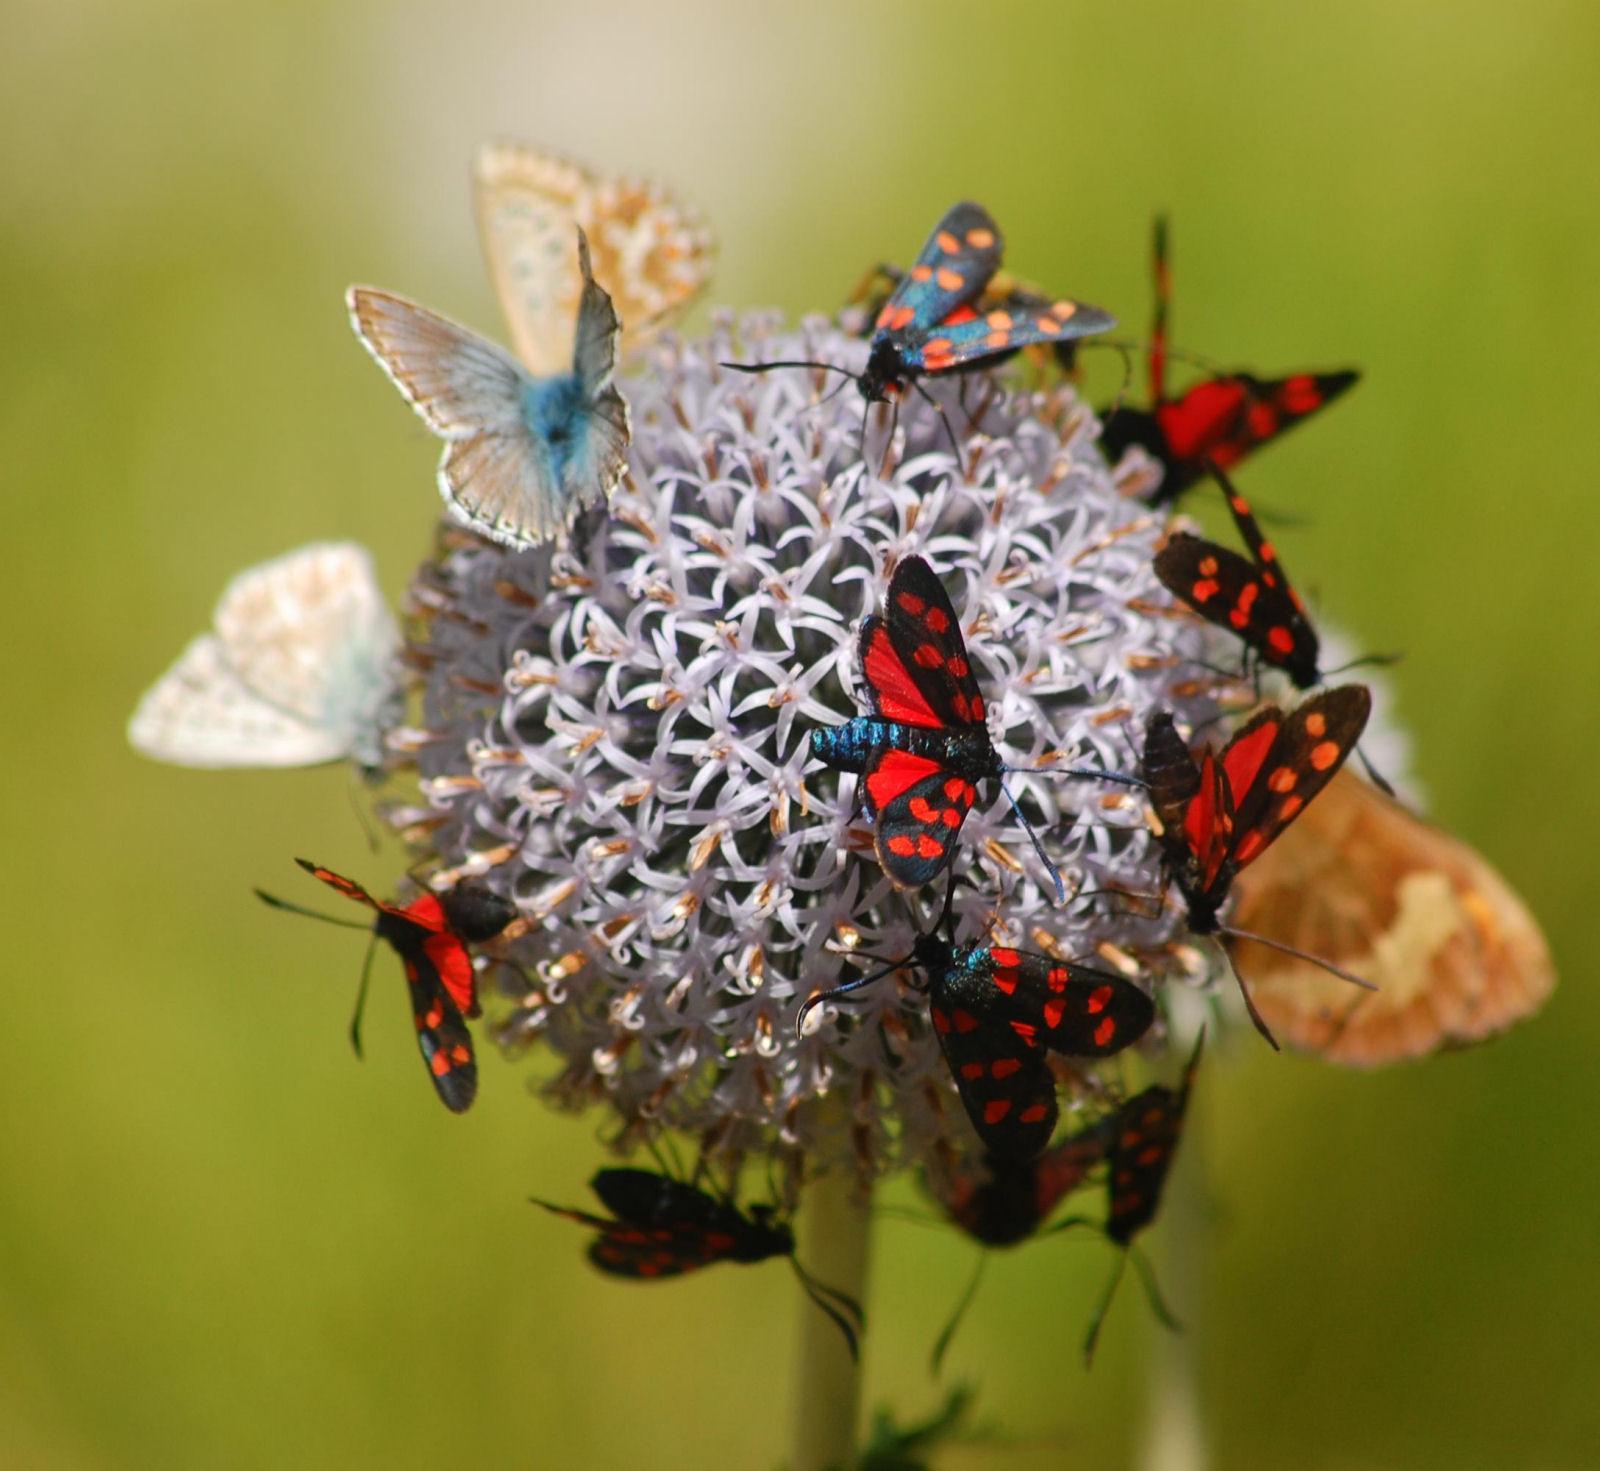 Butterflies on a flower in the Alpinum Juliana alpine botanical garden in Trenta, Slovenia